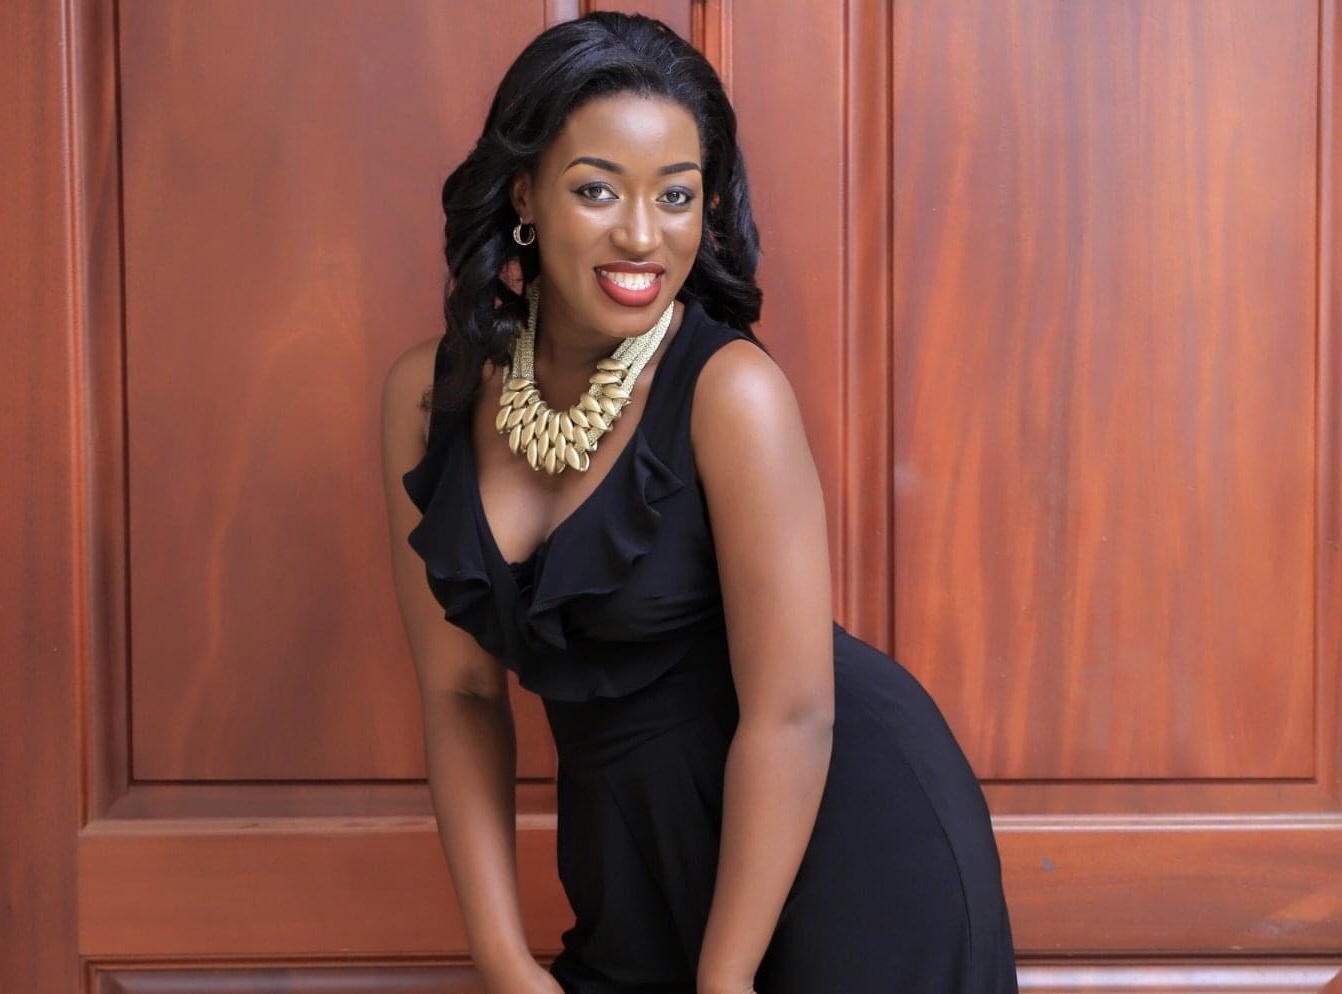 After 20 years on TV, Faridah Nakazibwe still rents - Justine ...